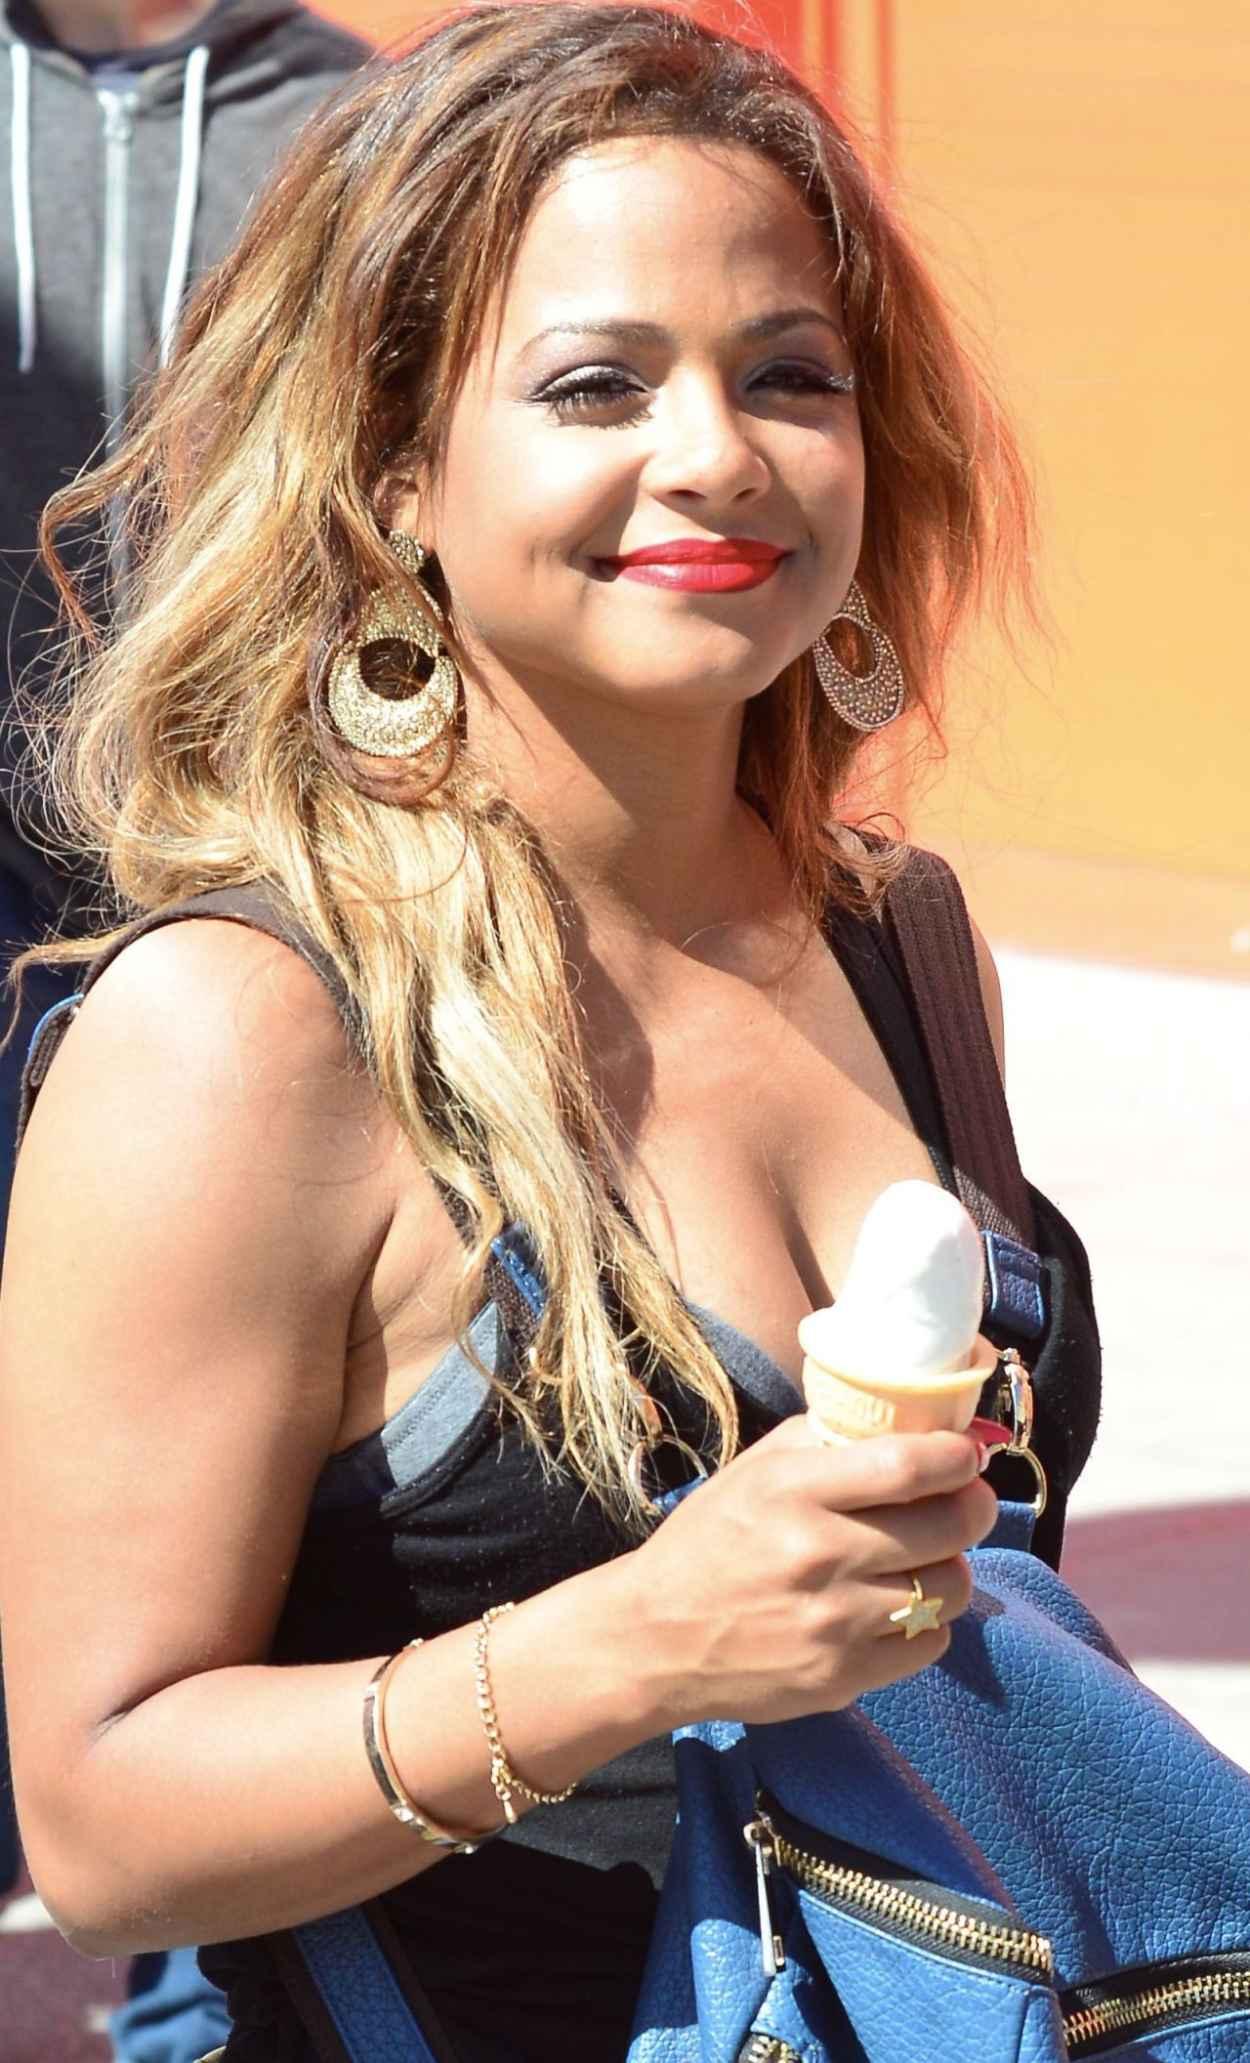 Christina Milian - Enjoying an Ice Cream on Venice Beach, Los Angeles - April 2015-1